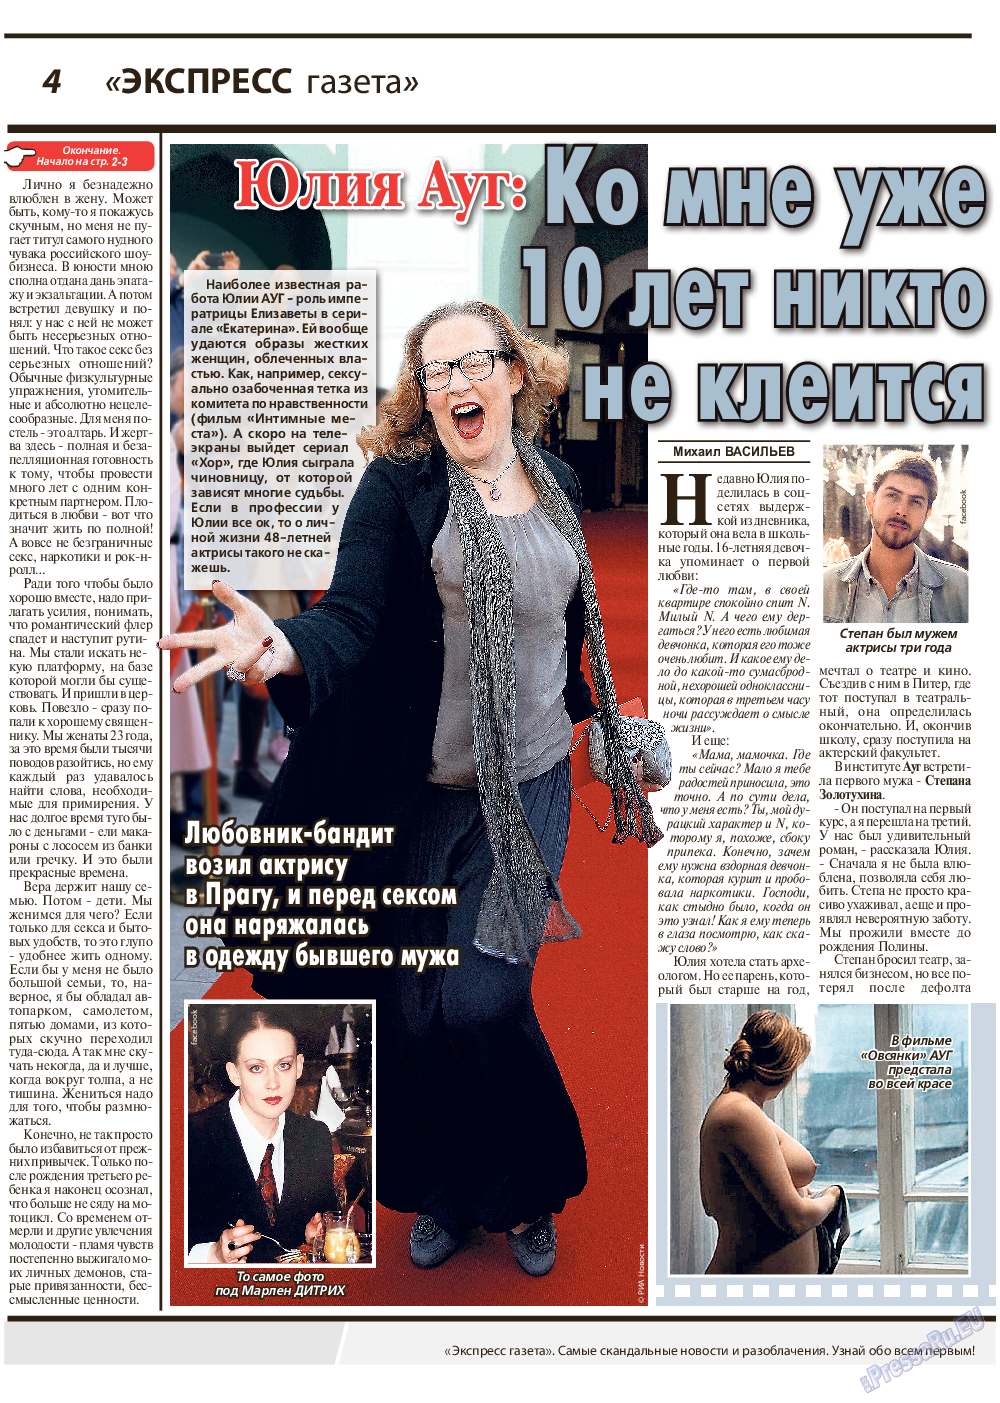 Экспресс газета (газета). 2019 год, номер 6, стр. 4